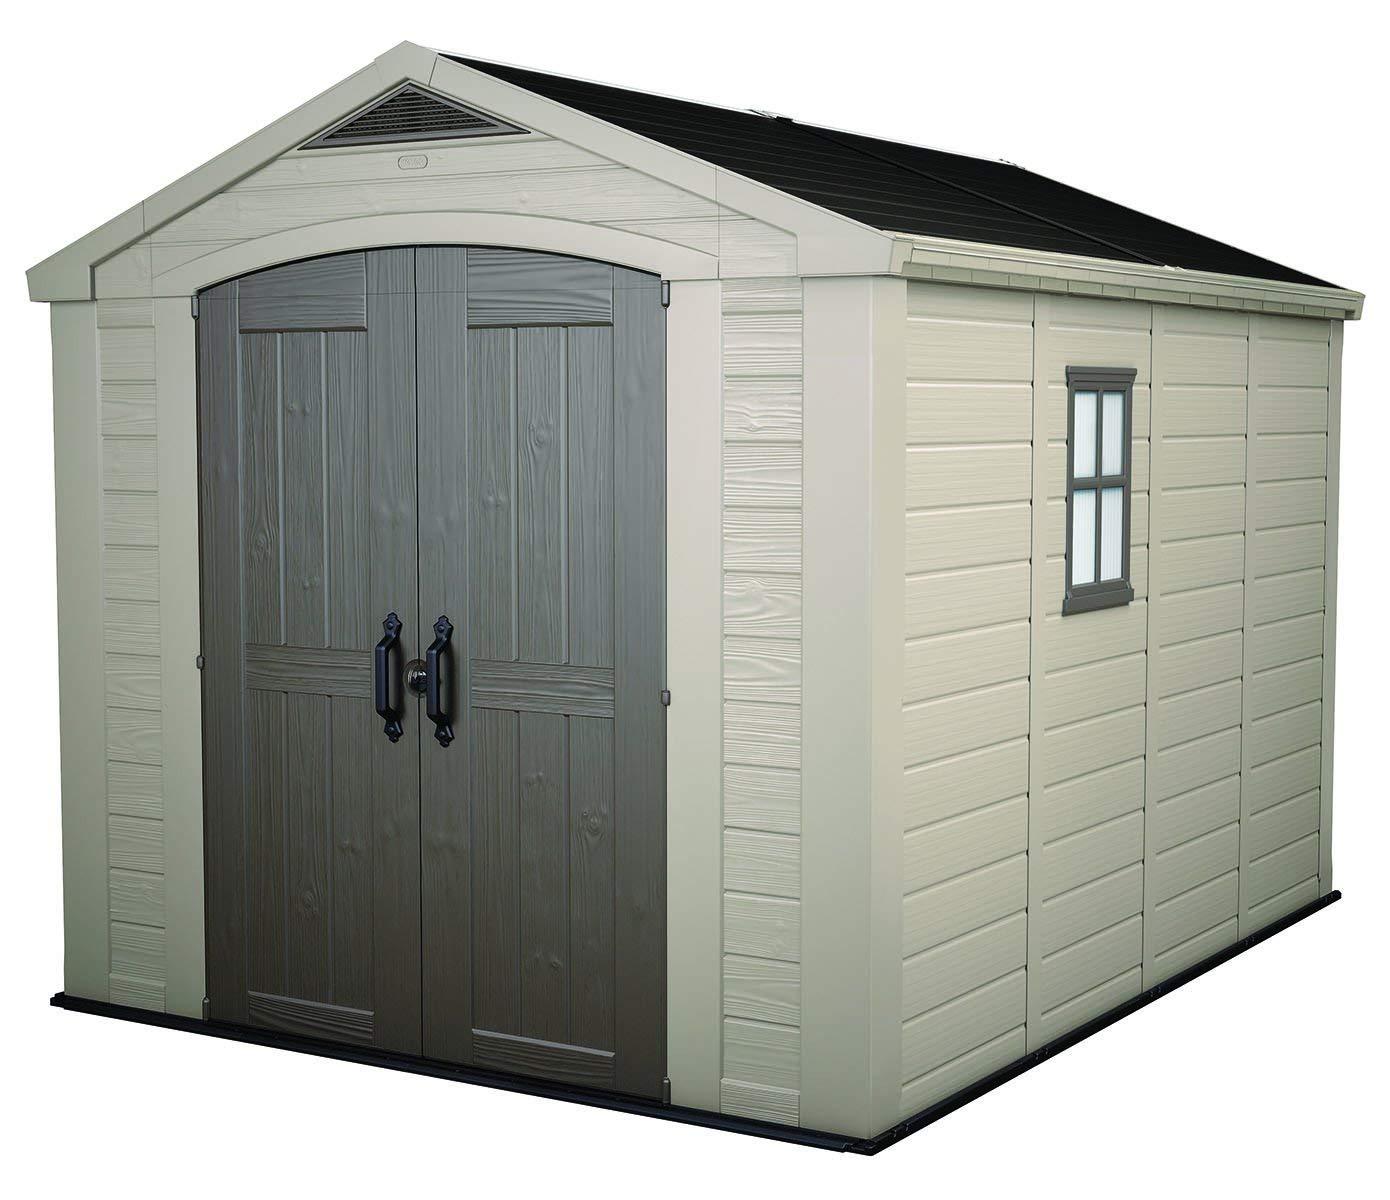 plastic garden shed amazon.com : keter factor large 8 x 11 ft. resin outdoor yard AAXOEMM